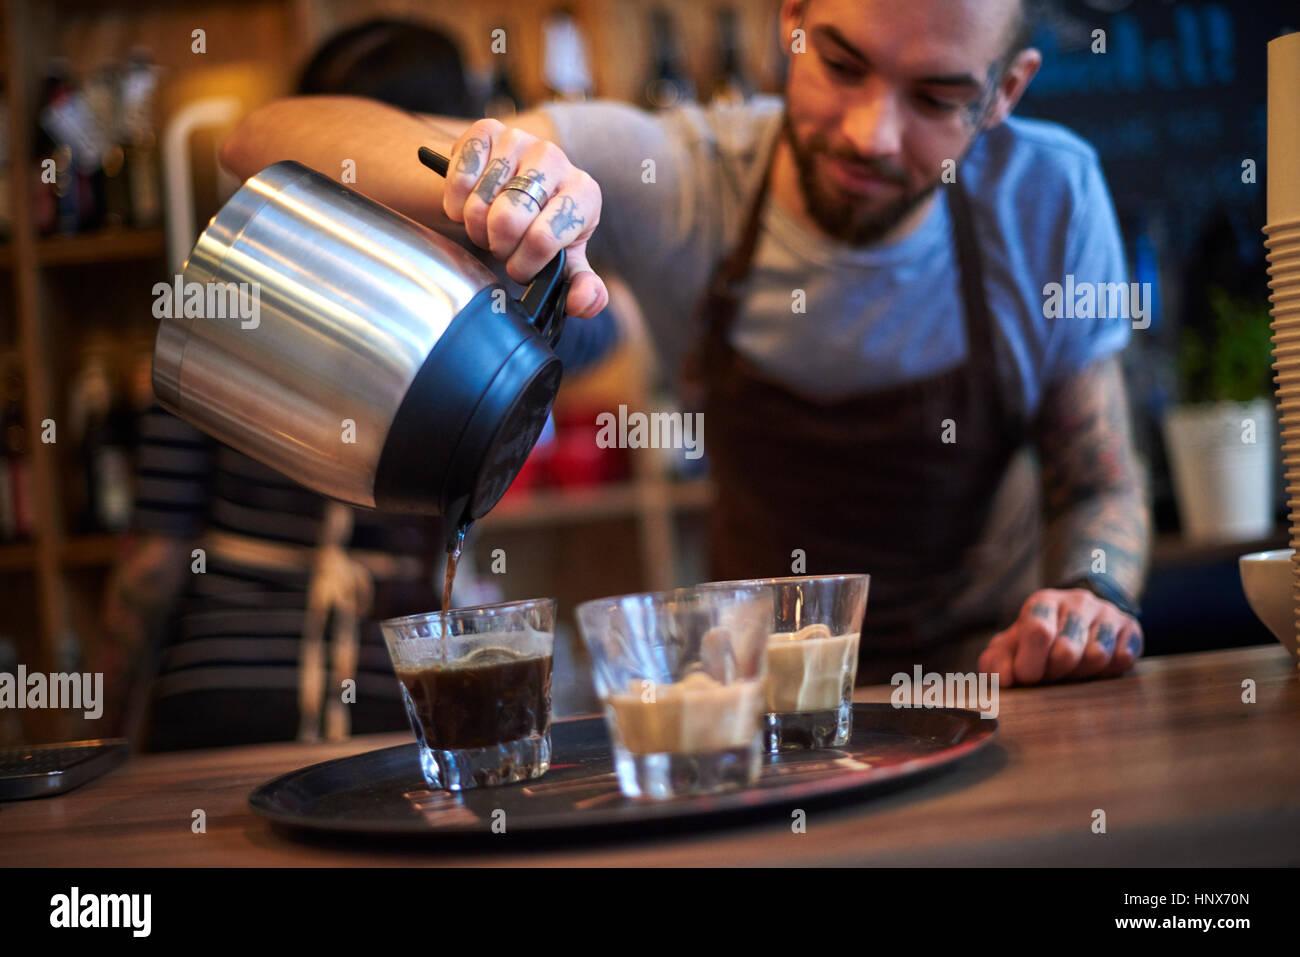 Barista making coffee - Stock Image